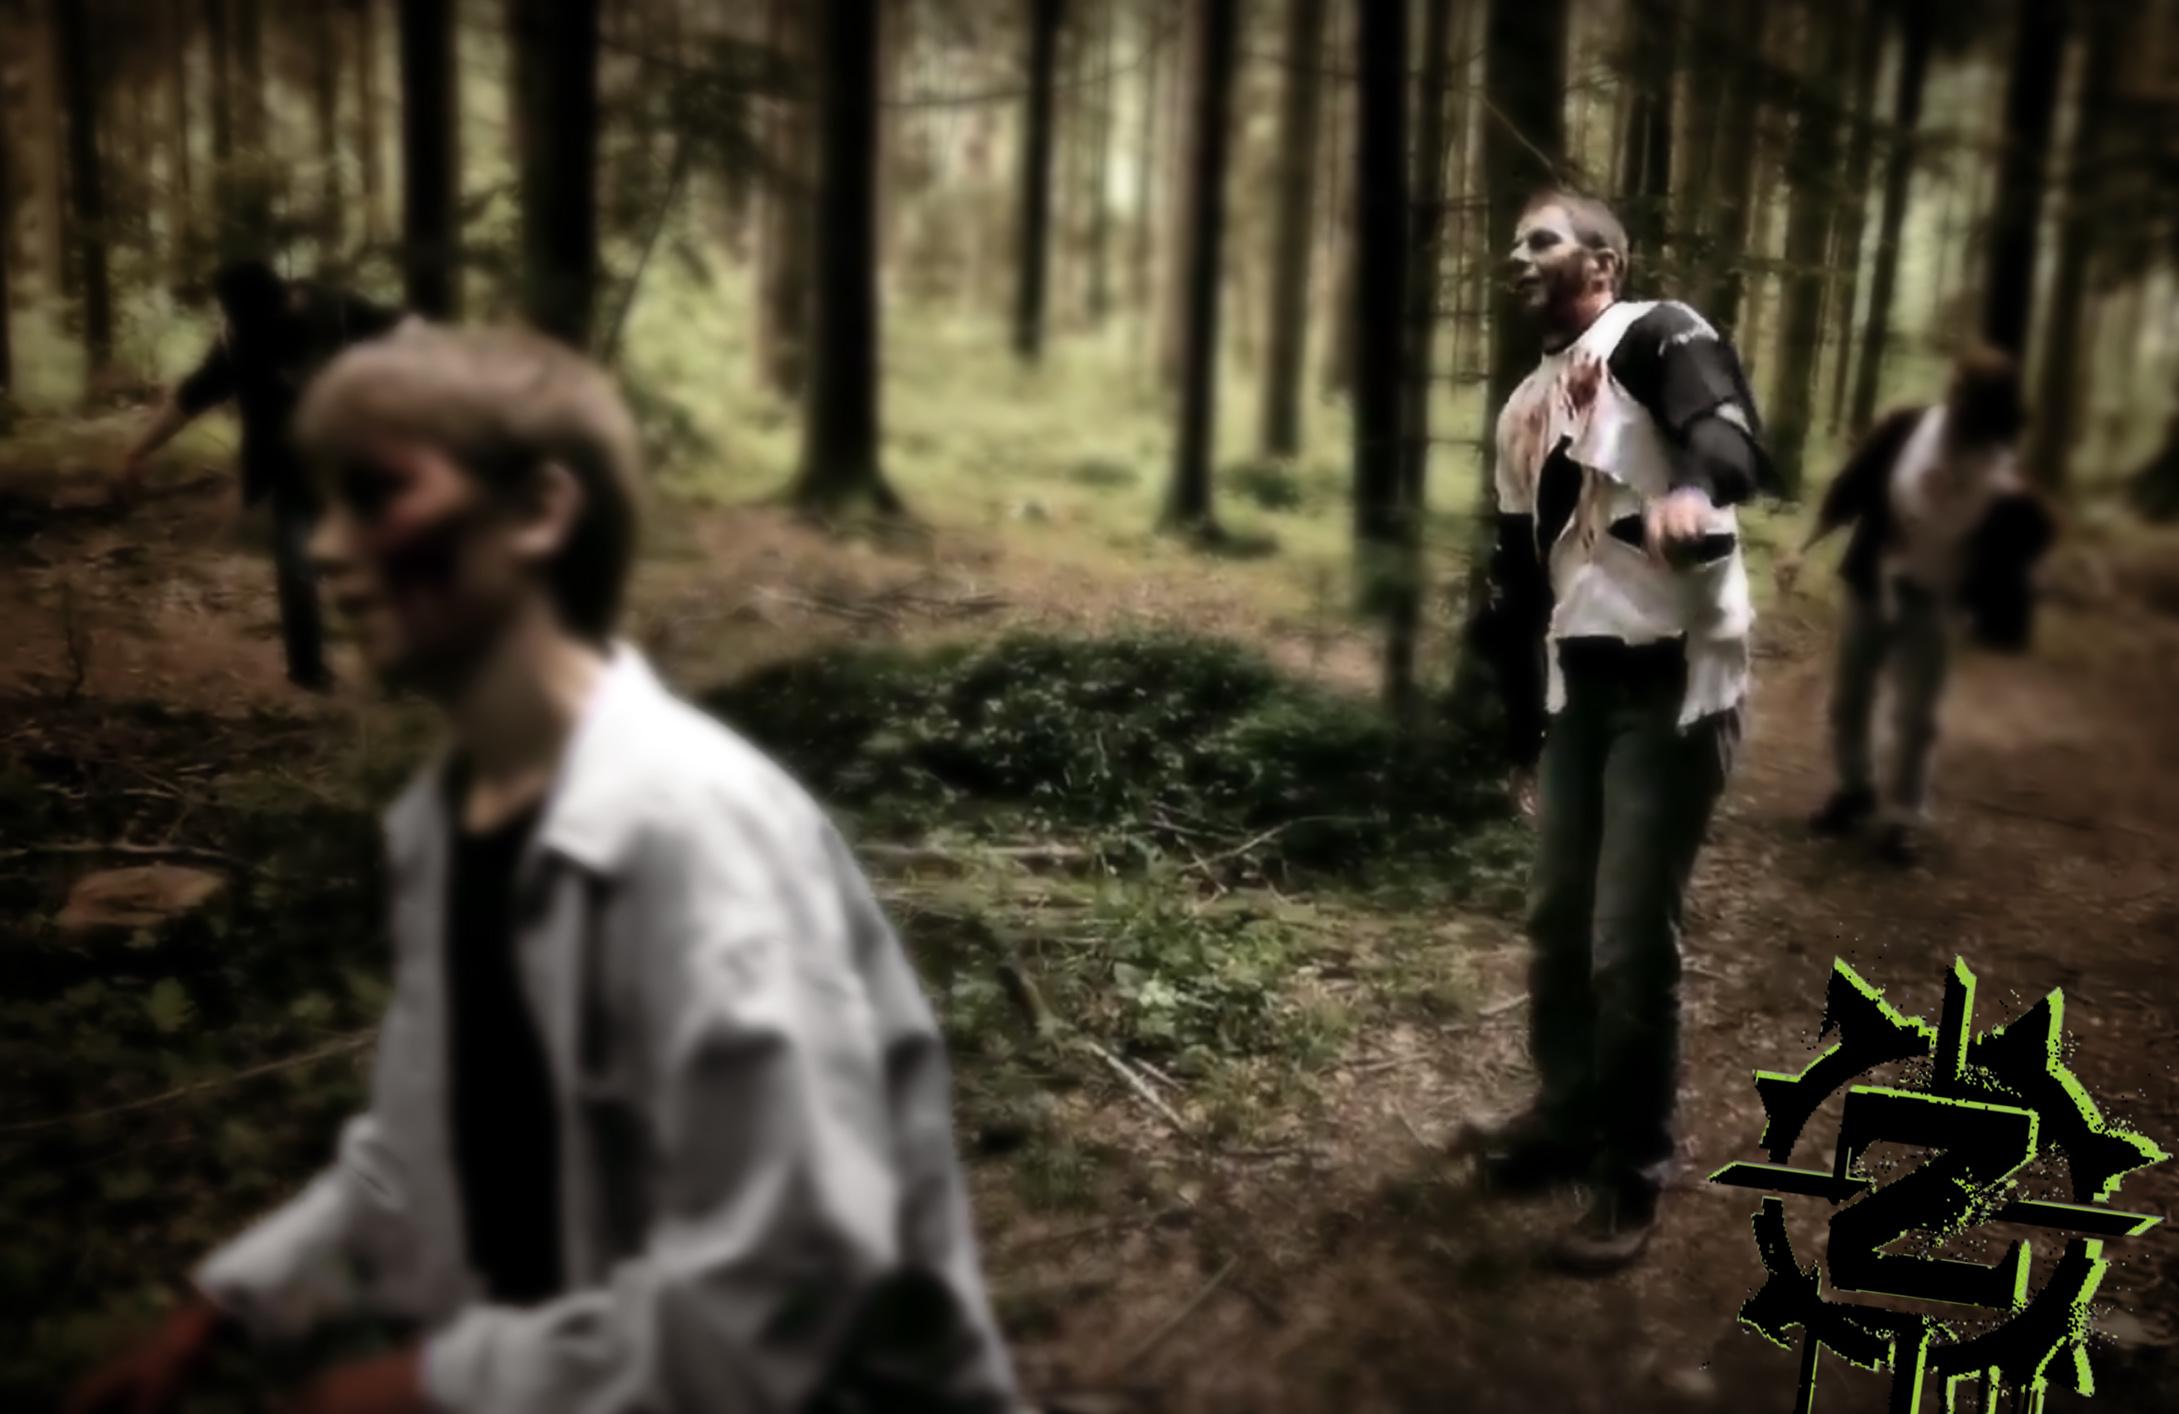 Screenshot Zombiefilm (Zombies die laufen.)